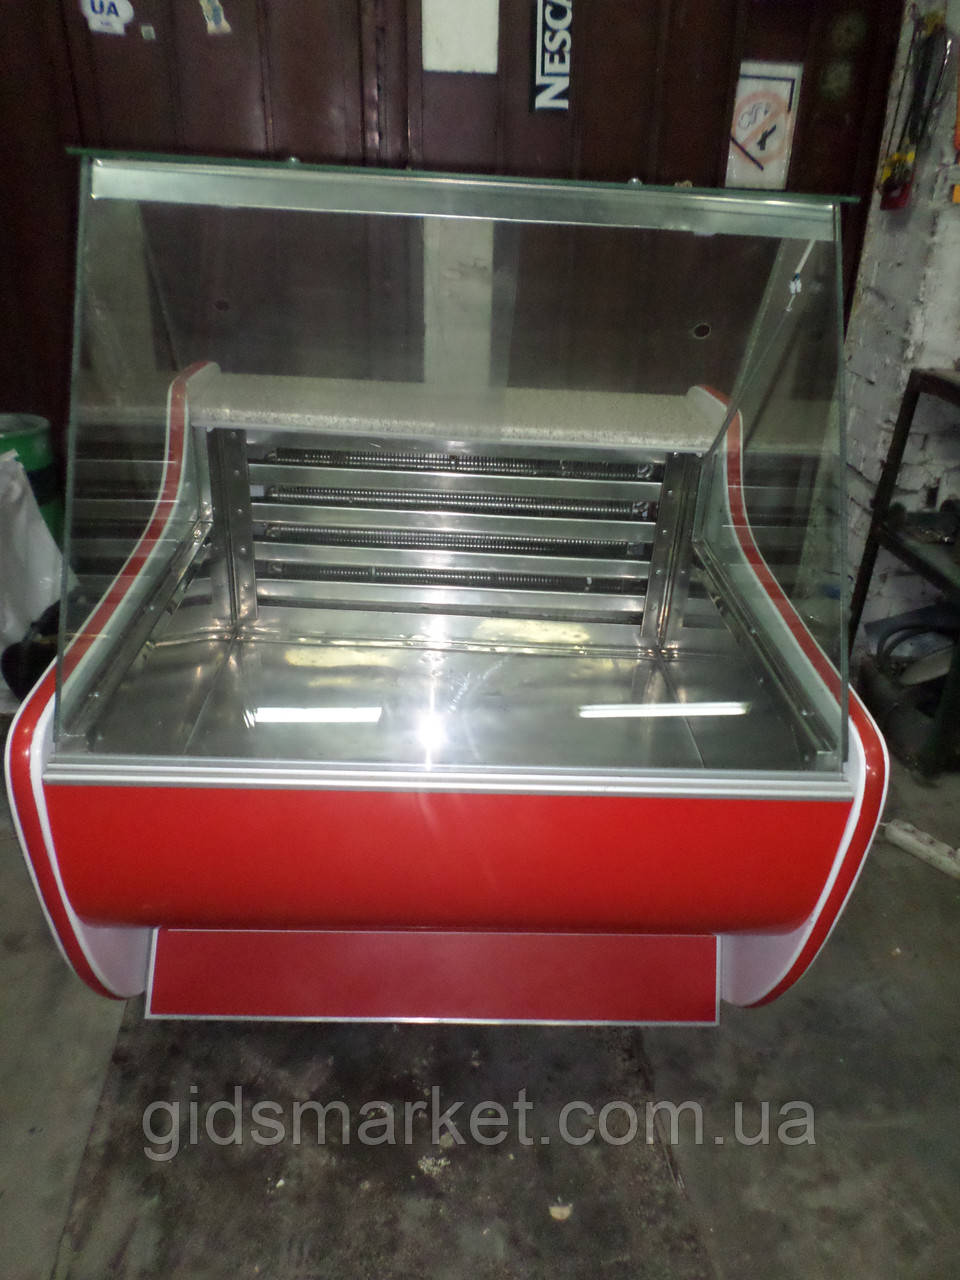 Морозильная витрина 1м. JBG б у Прилавок морозильный бу